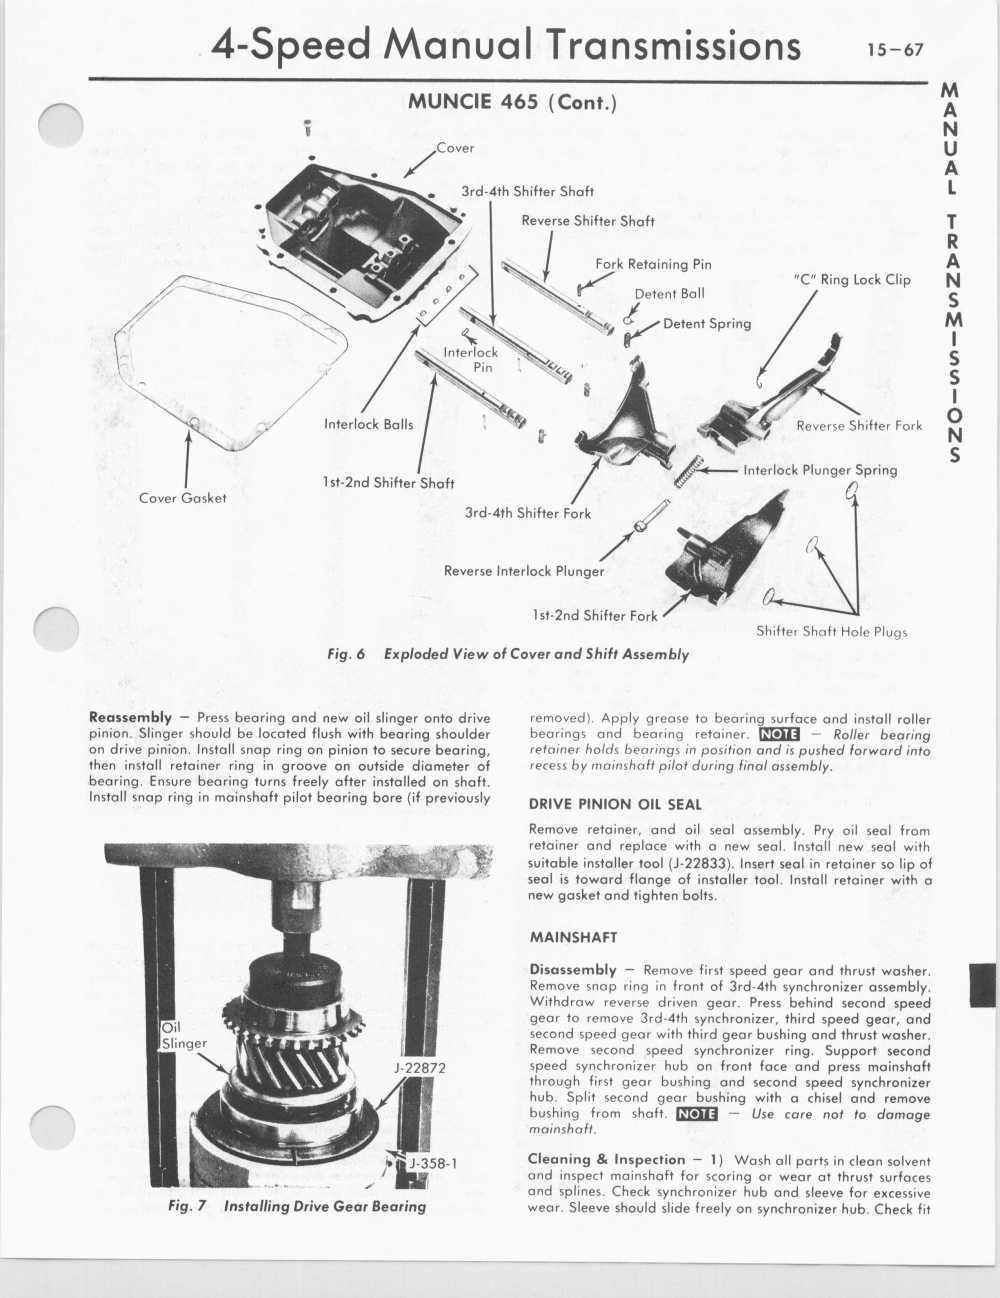 medium resolution of sm465 diagram